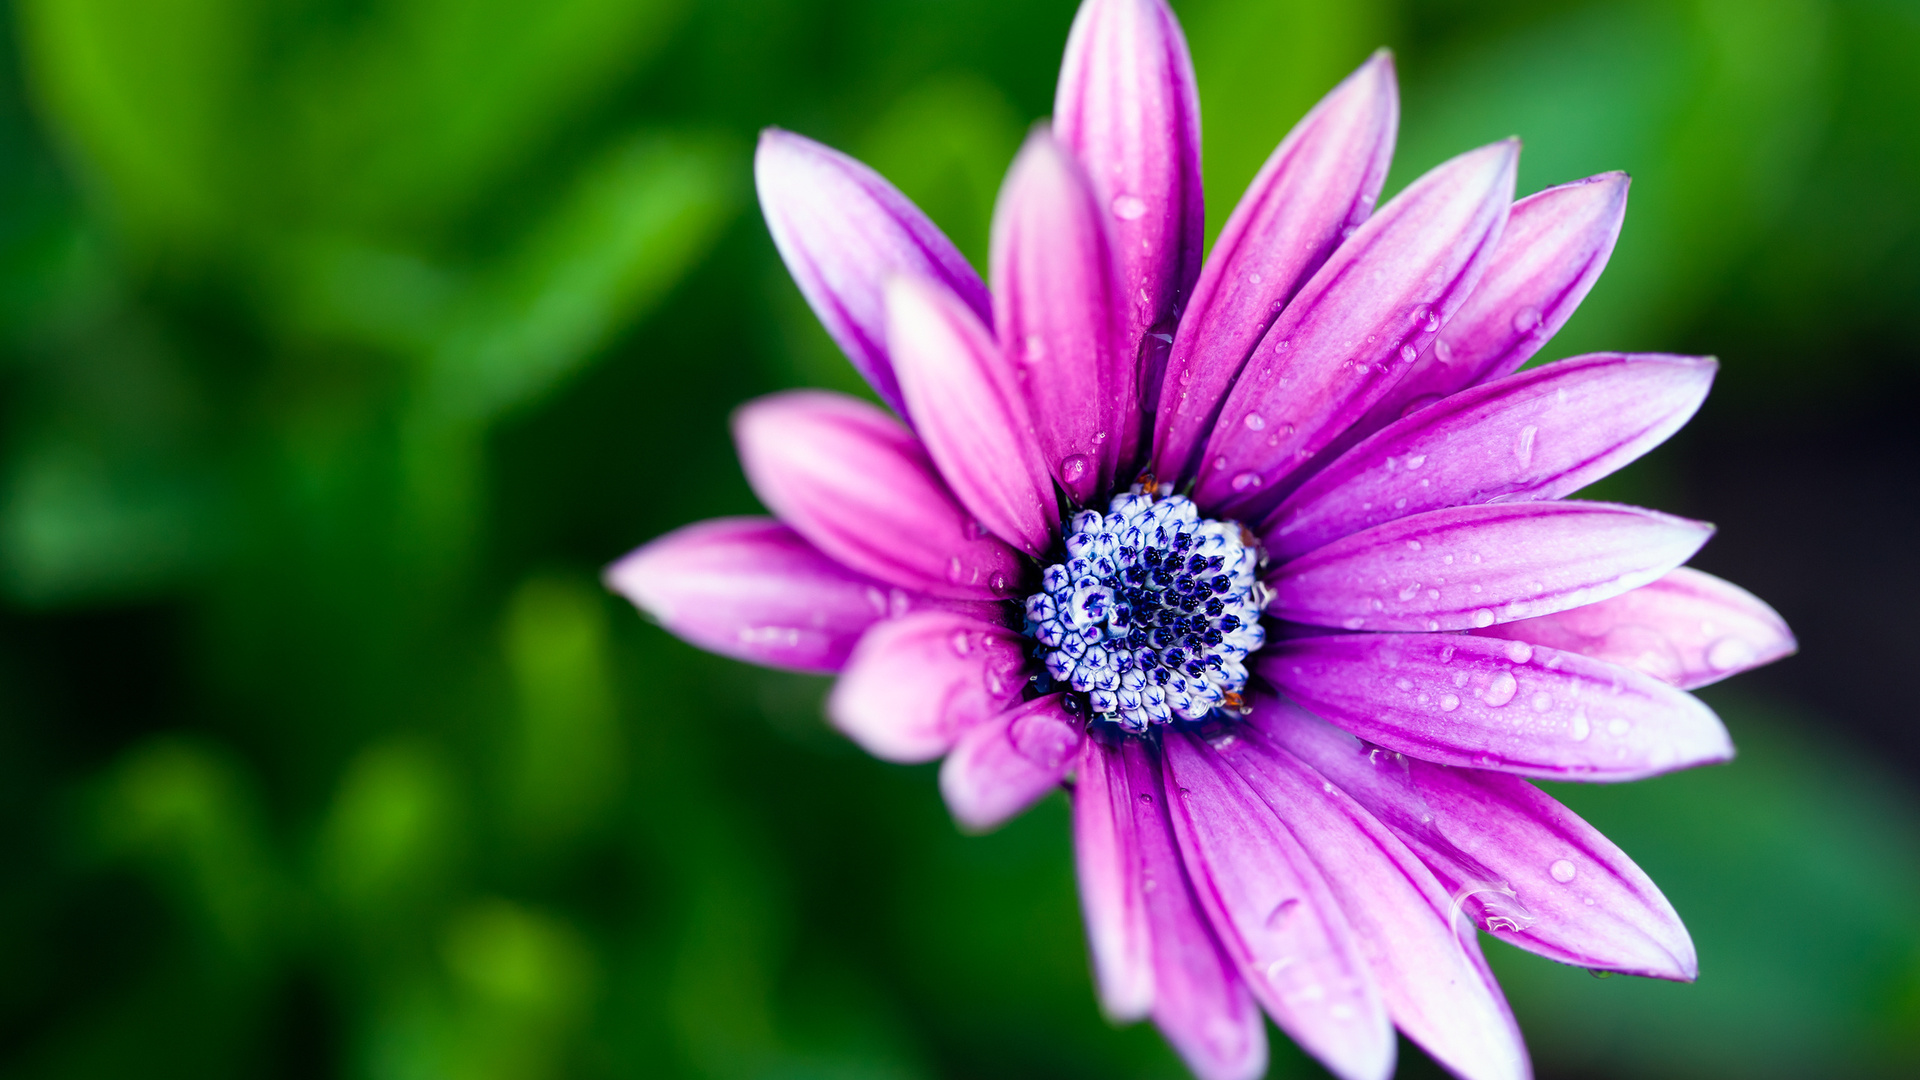 хочу цветочки картинка процесс пошива